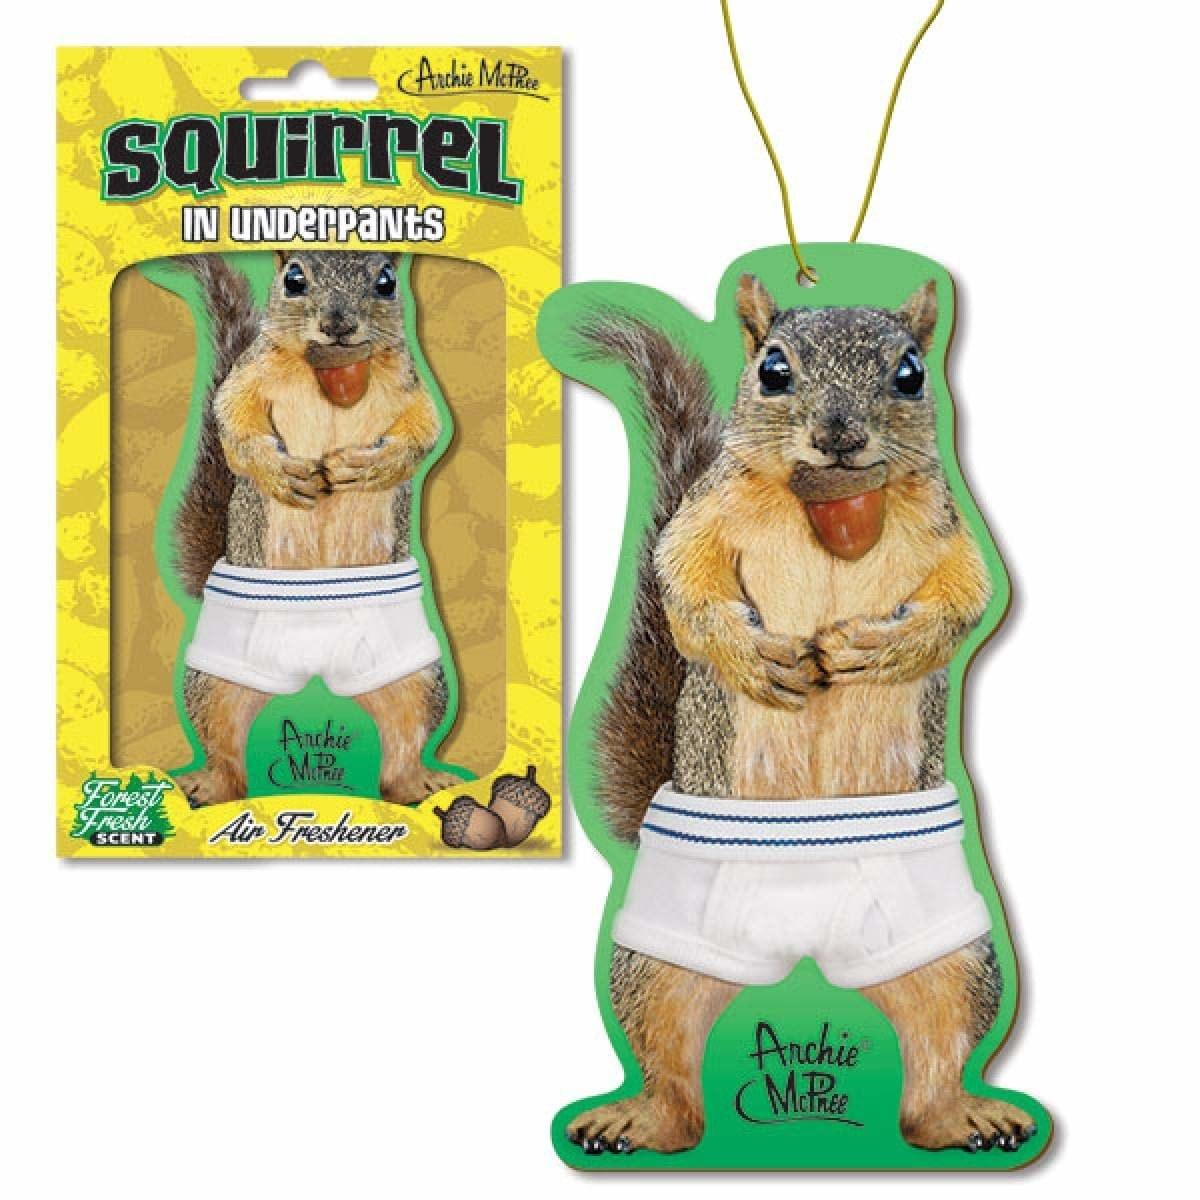 car air freshener shaped like a squirrel wearing human underpants